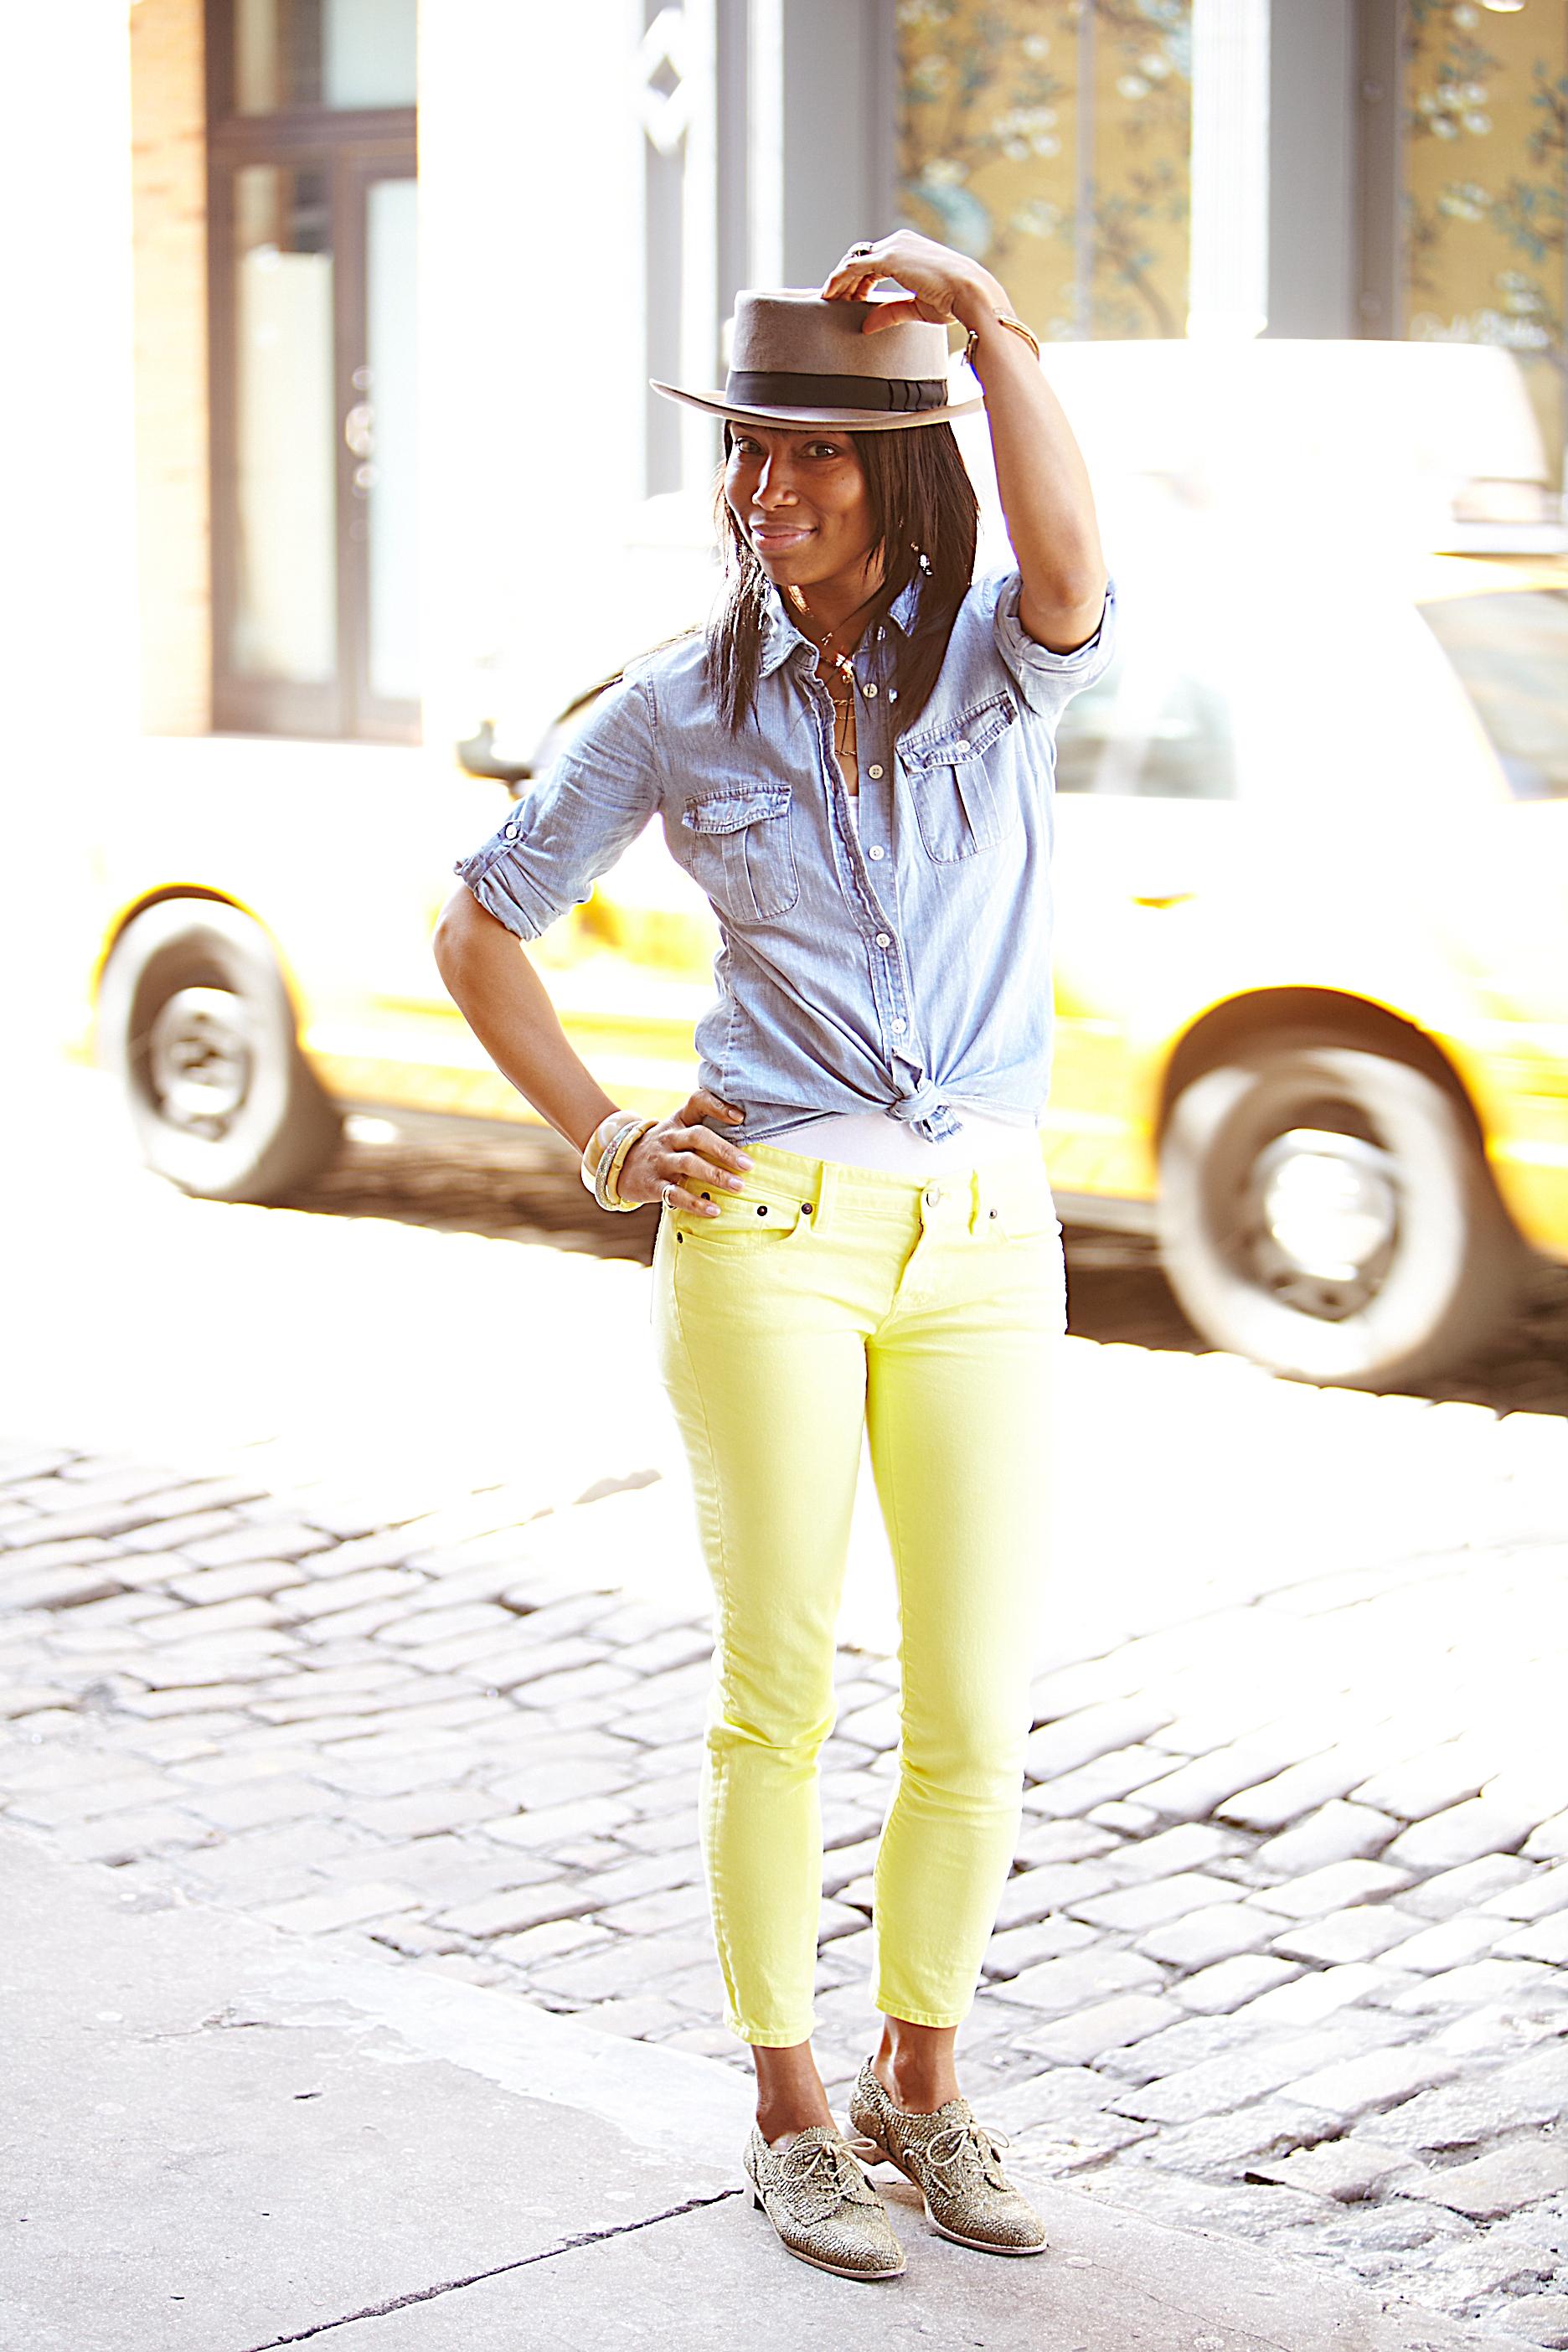 jodie citrus pants full photo.jpg